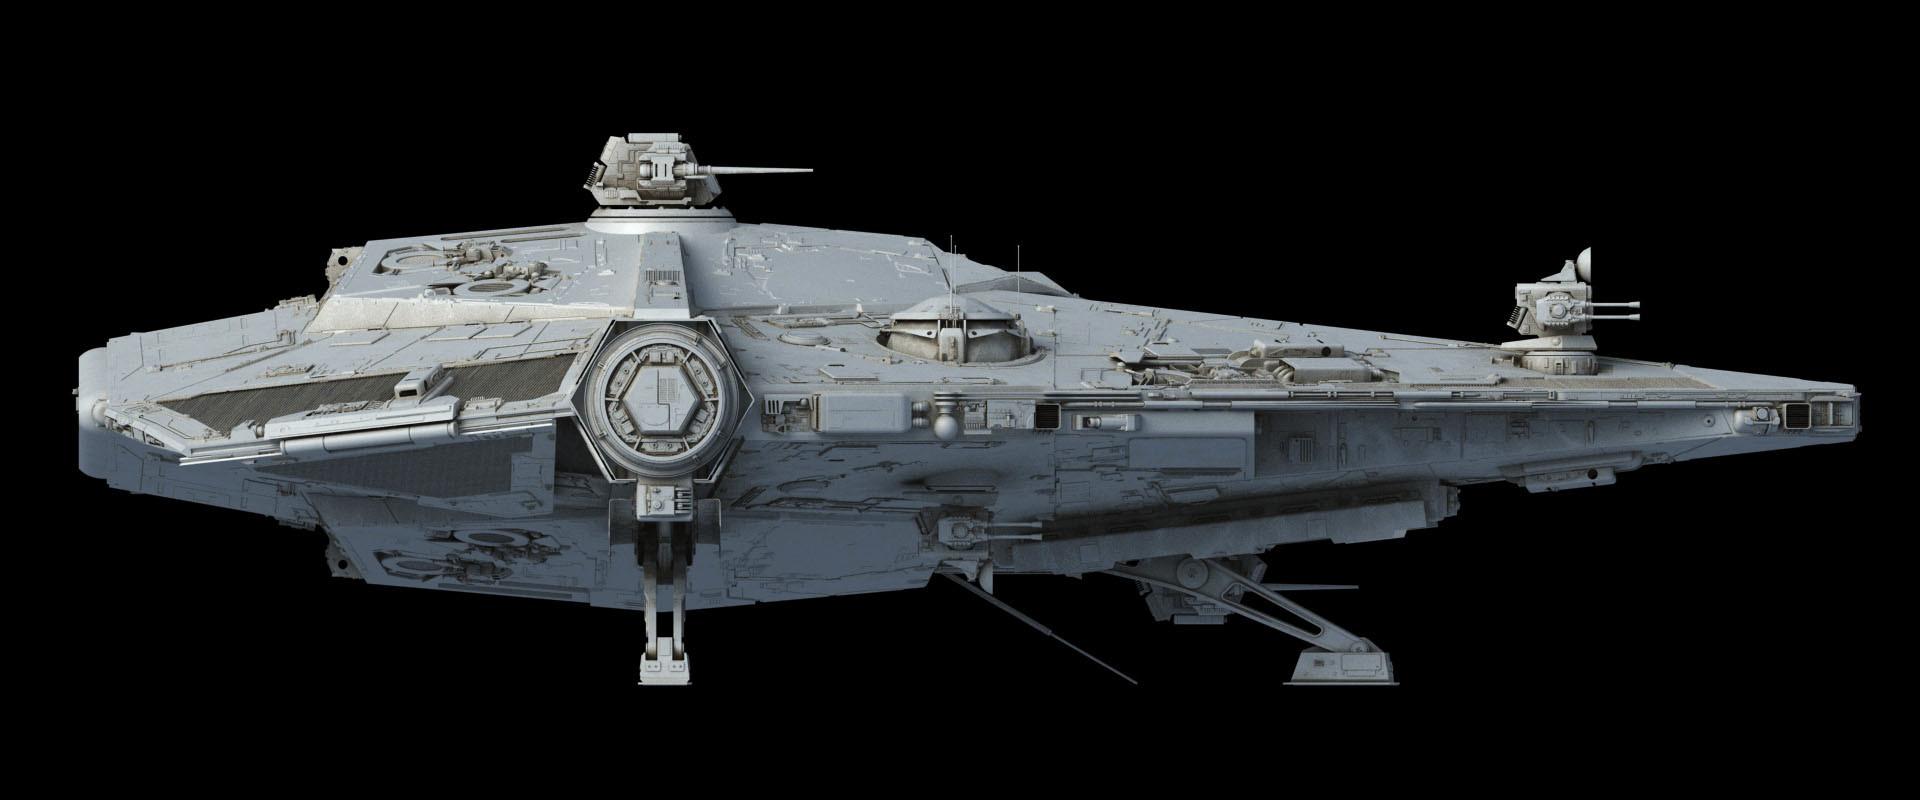 Ansel hsiao sloop starboard2